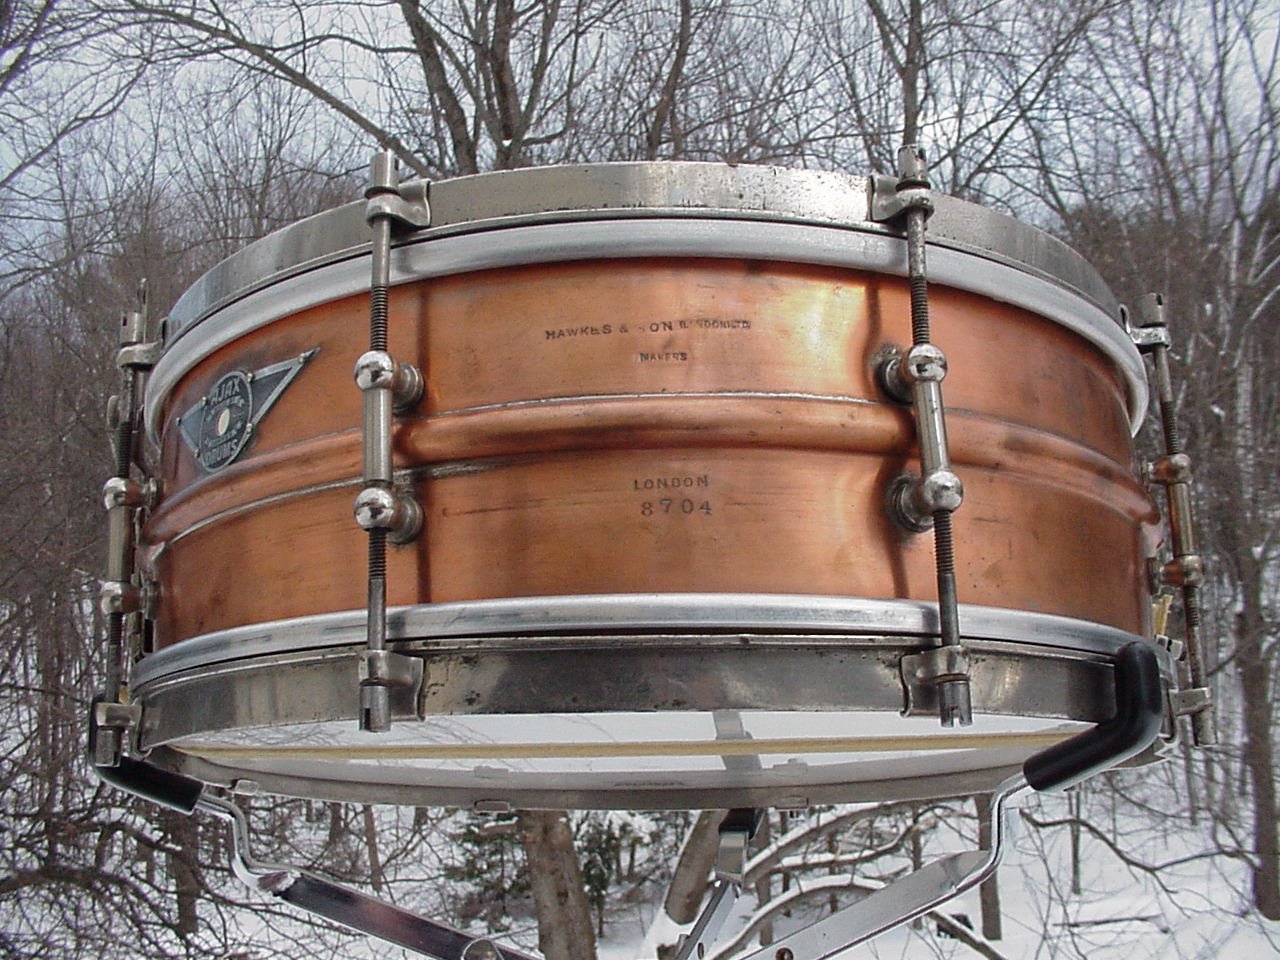 SONOR drums NEW T-SHIRT sizes S M L XL XXL black white grey brown maroon